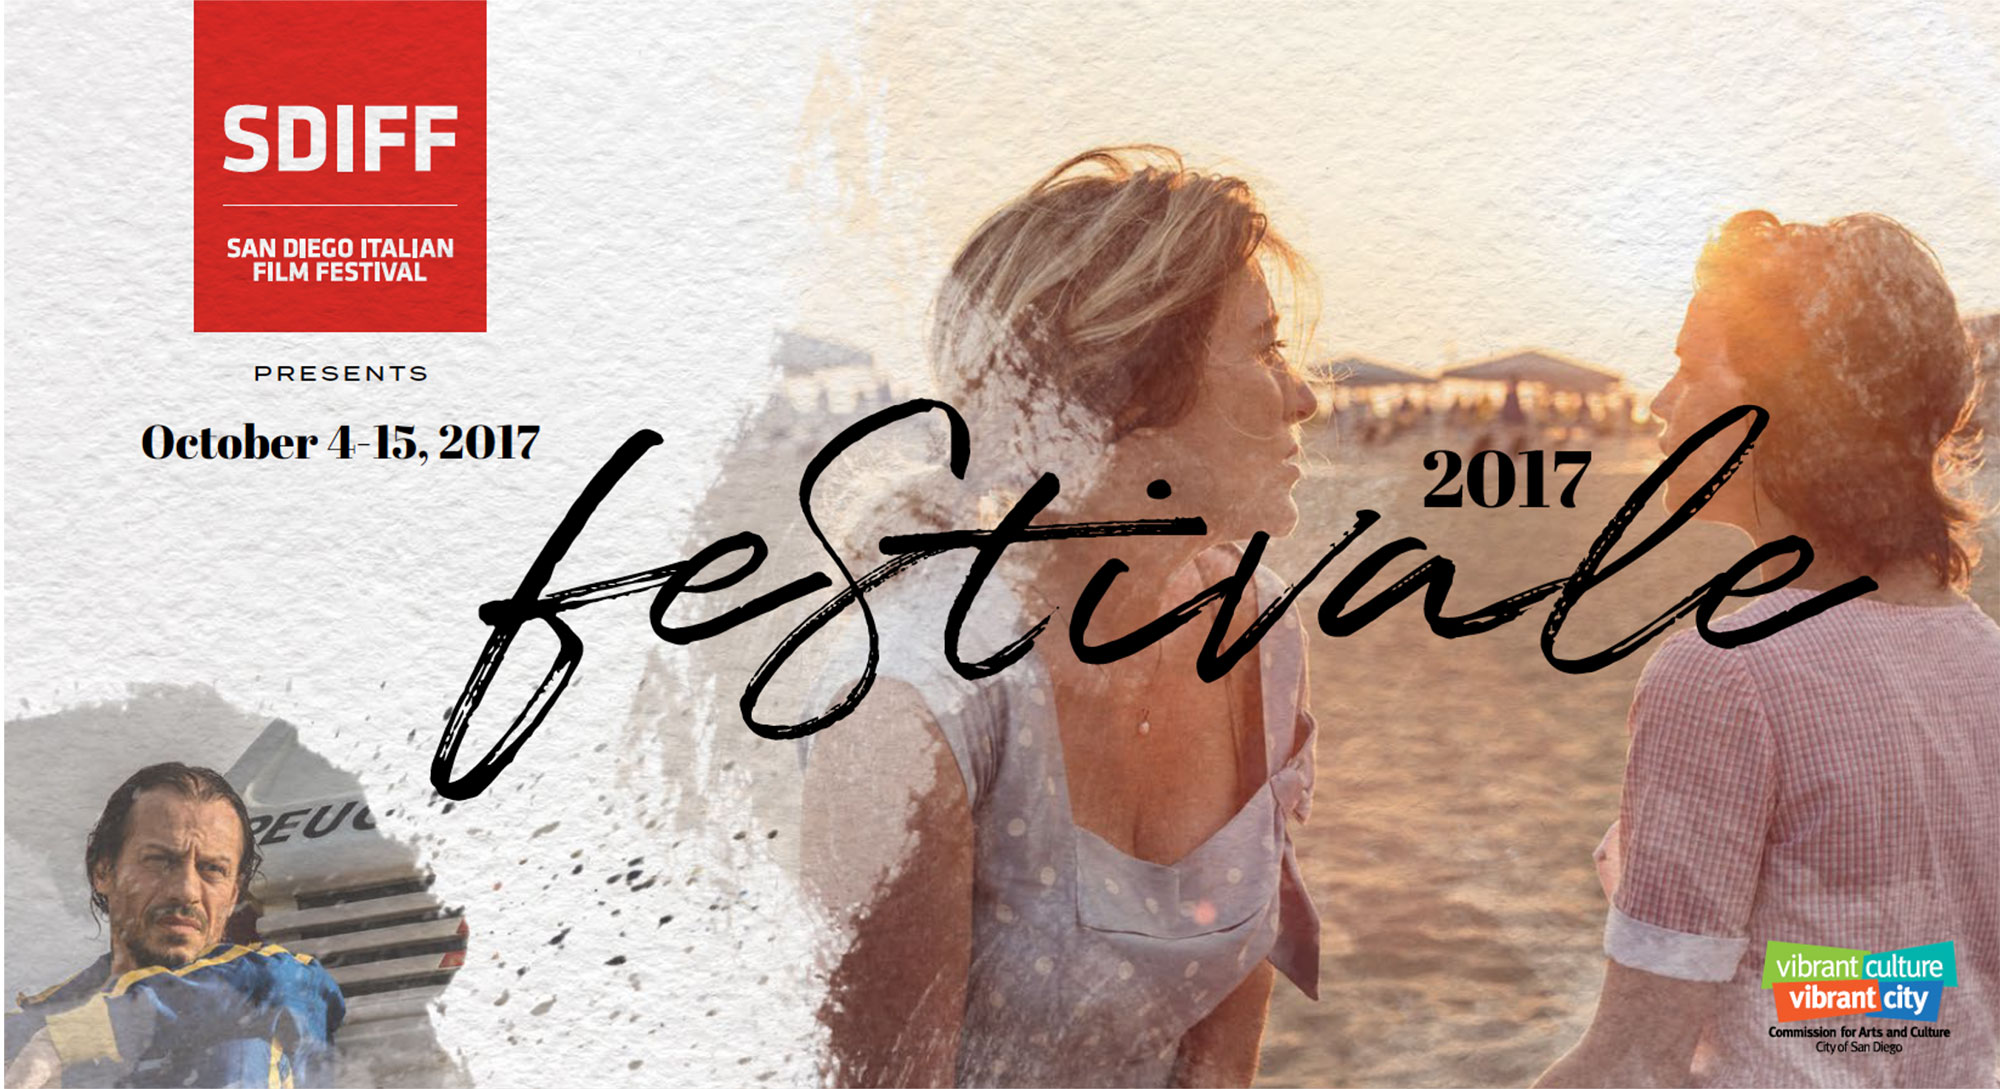 ron-miriello-grafico-san-diego-italian-film-festival-Miriello-branding-officina-06jpg